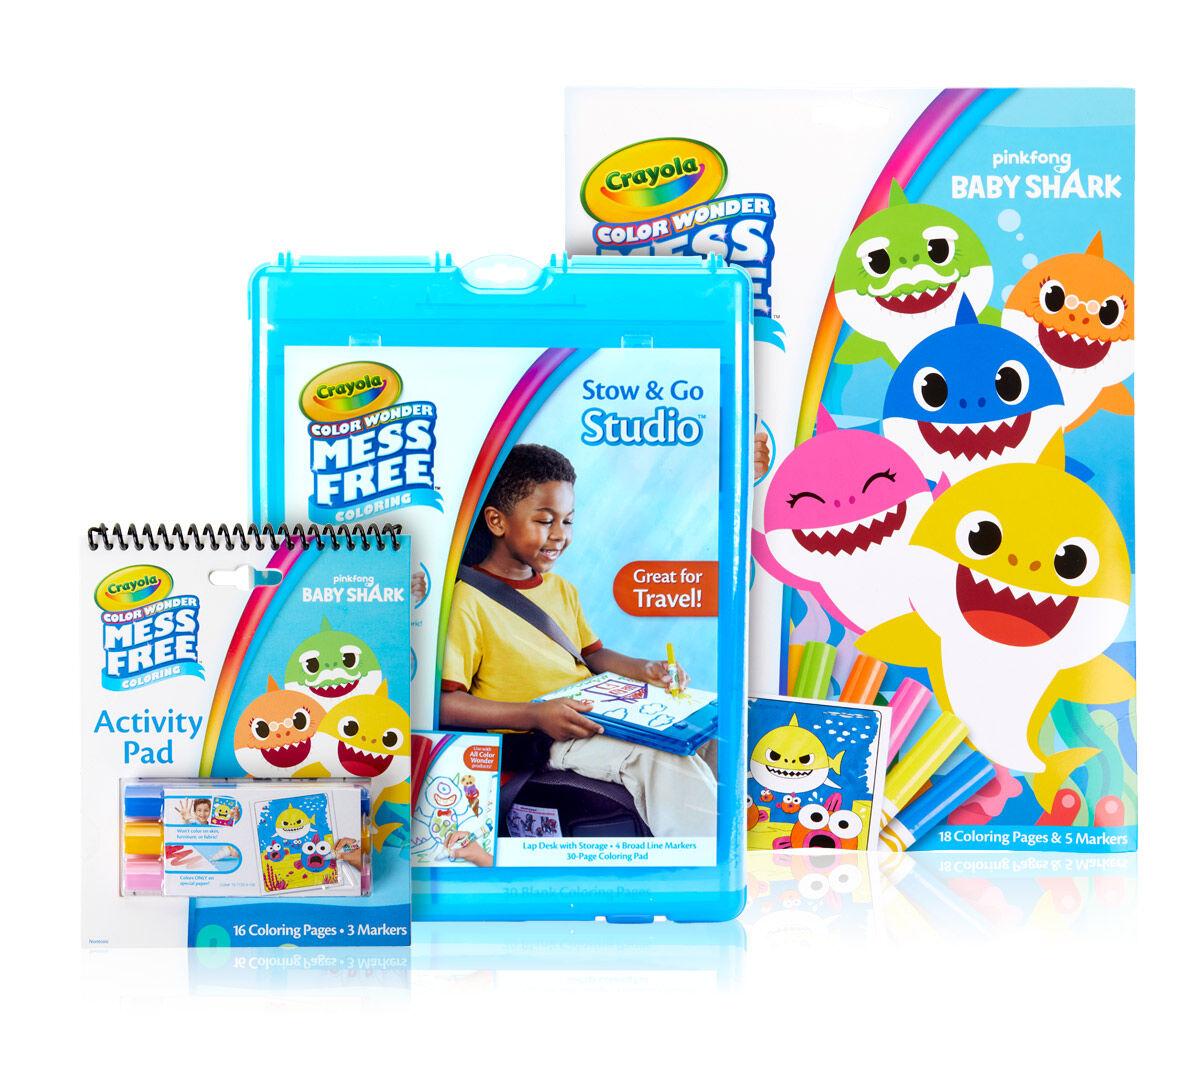 Color Wonder Mess Free Baby Shark Coloring Gift Set